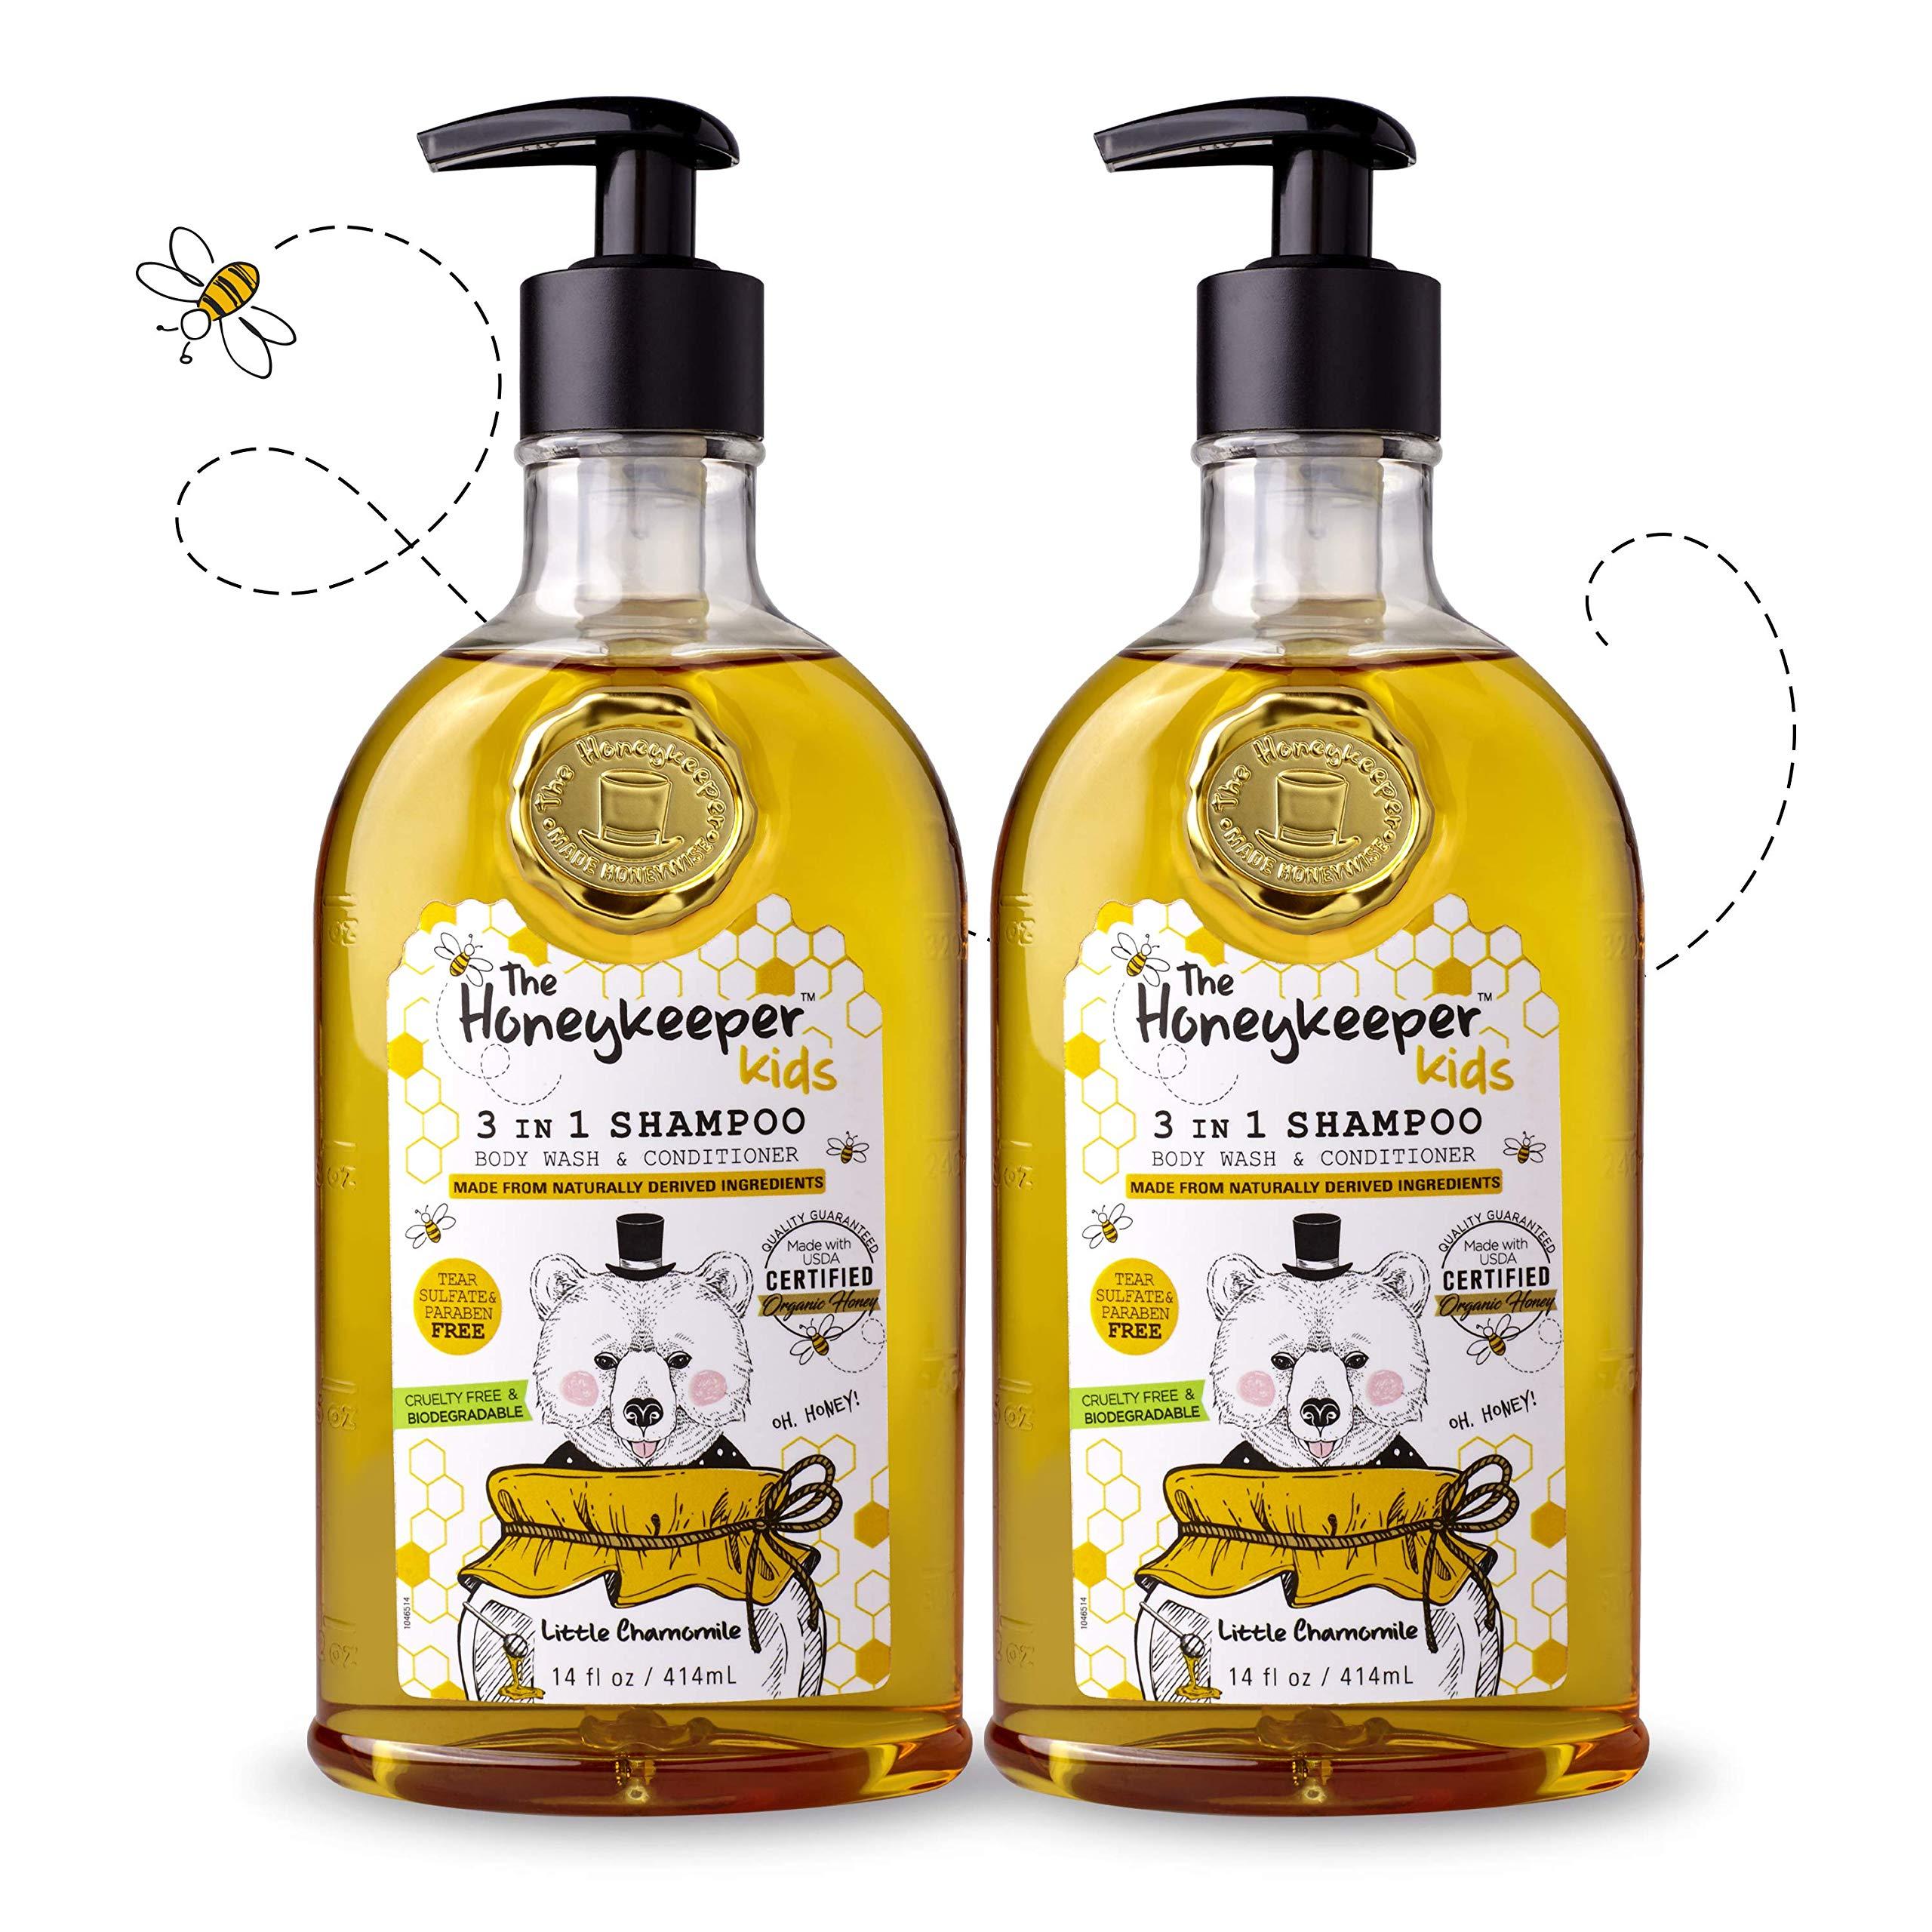 Honeykeeper Kids Shampoo Little Chamomile, 14 fl. oz. 2pk by The Honeykeeper